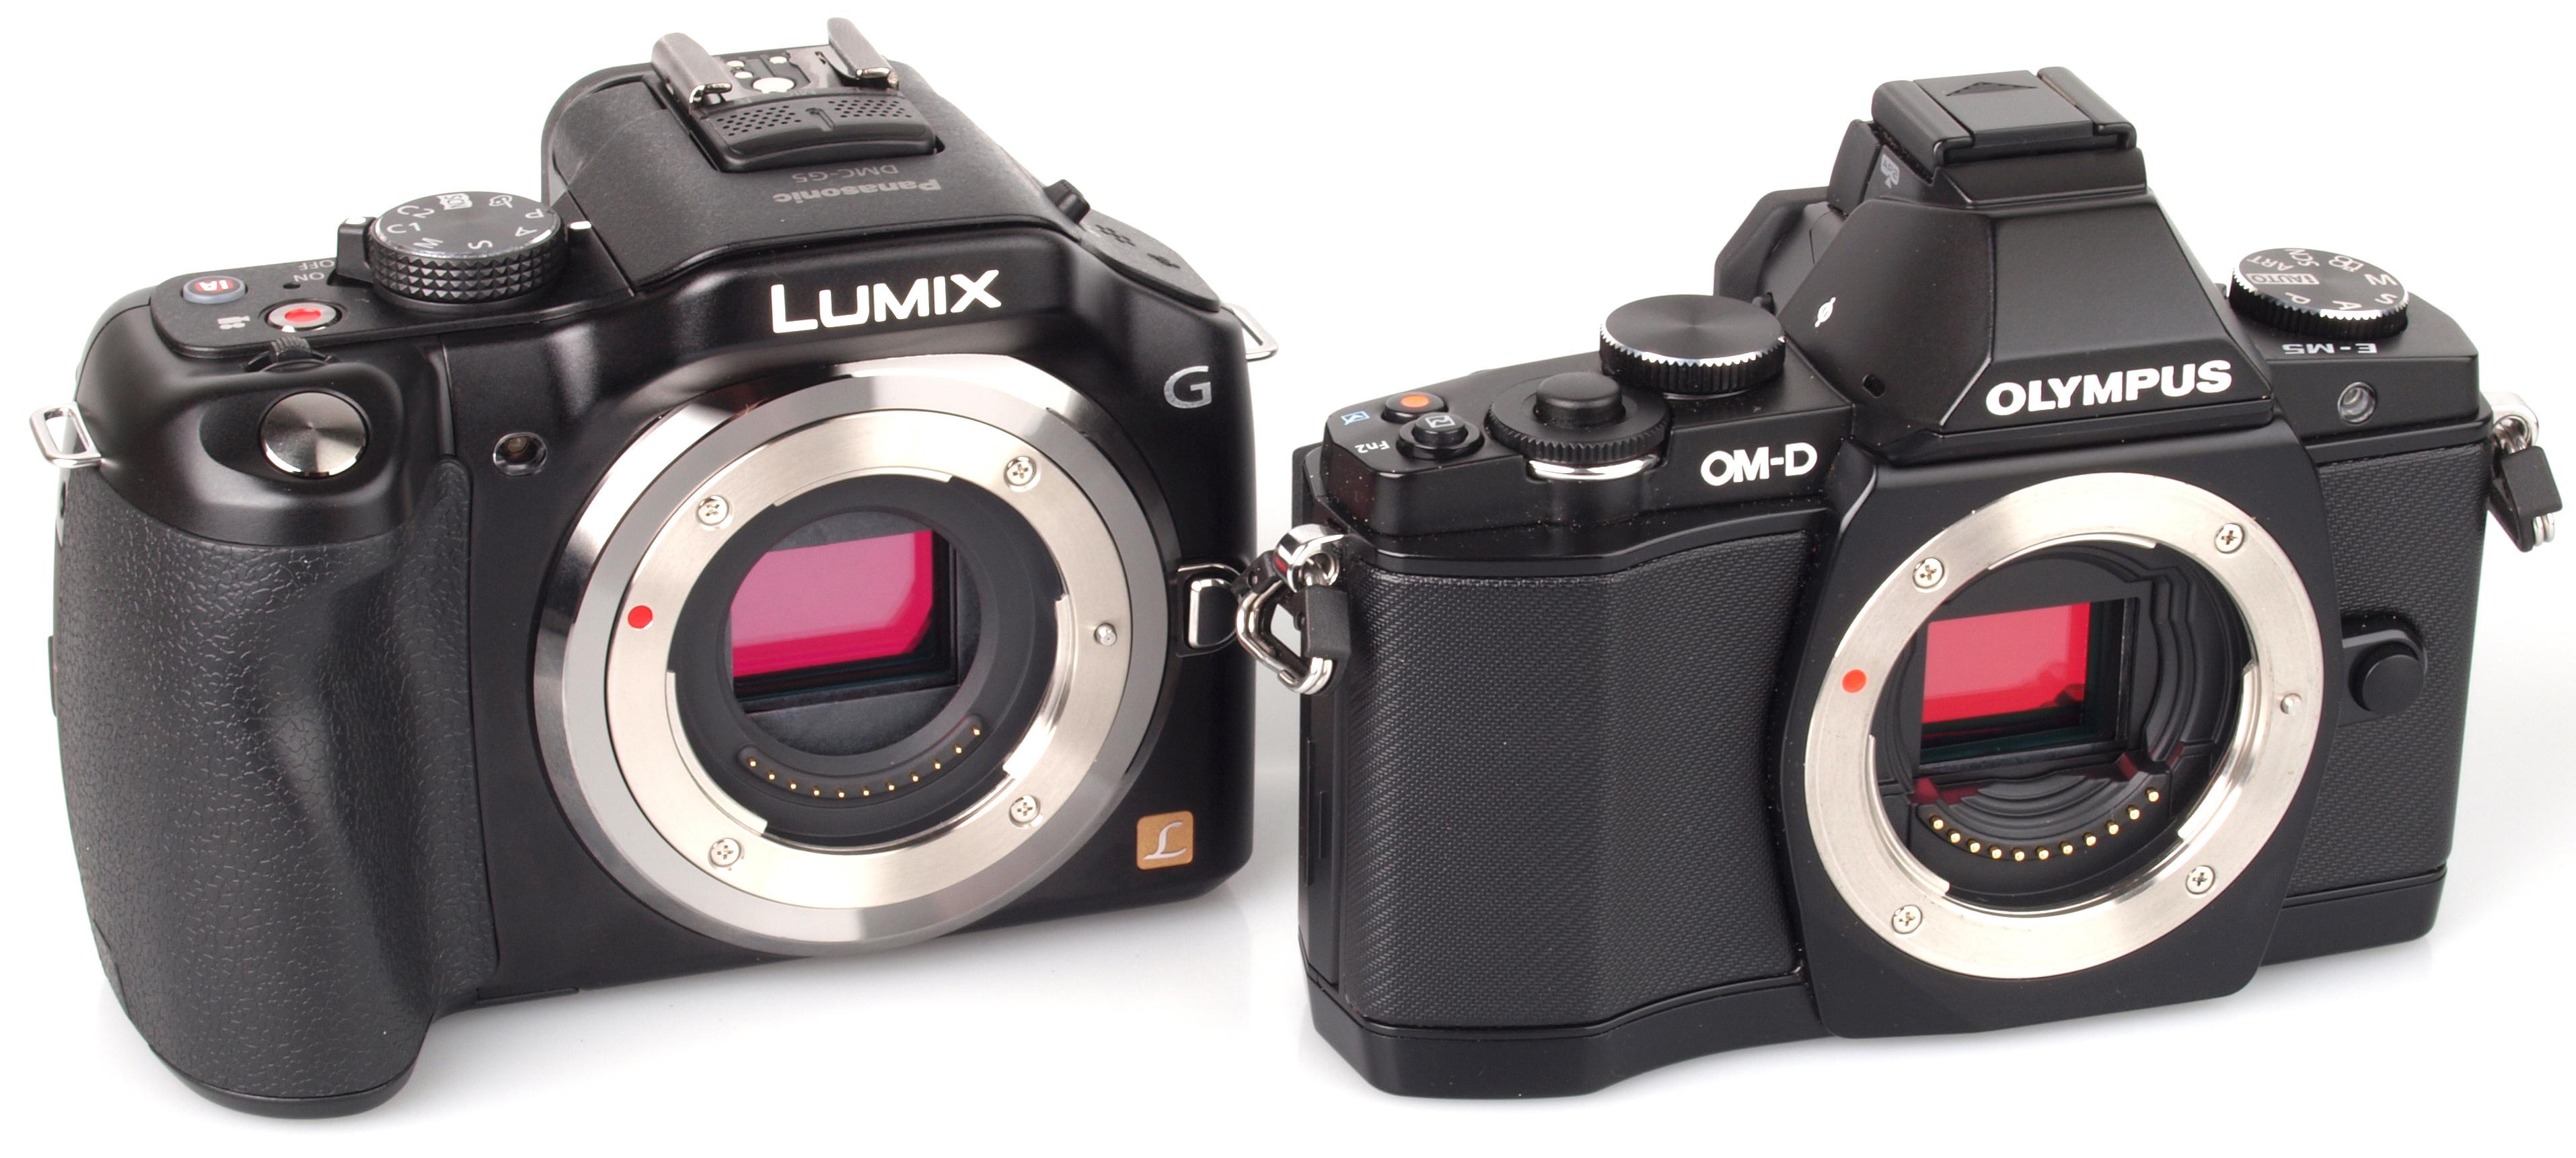 Panasonic Lumix G5 Vs Olympus OM-D E-M5